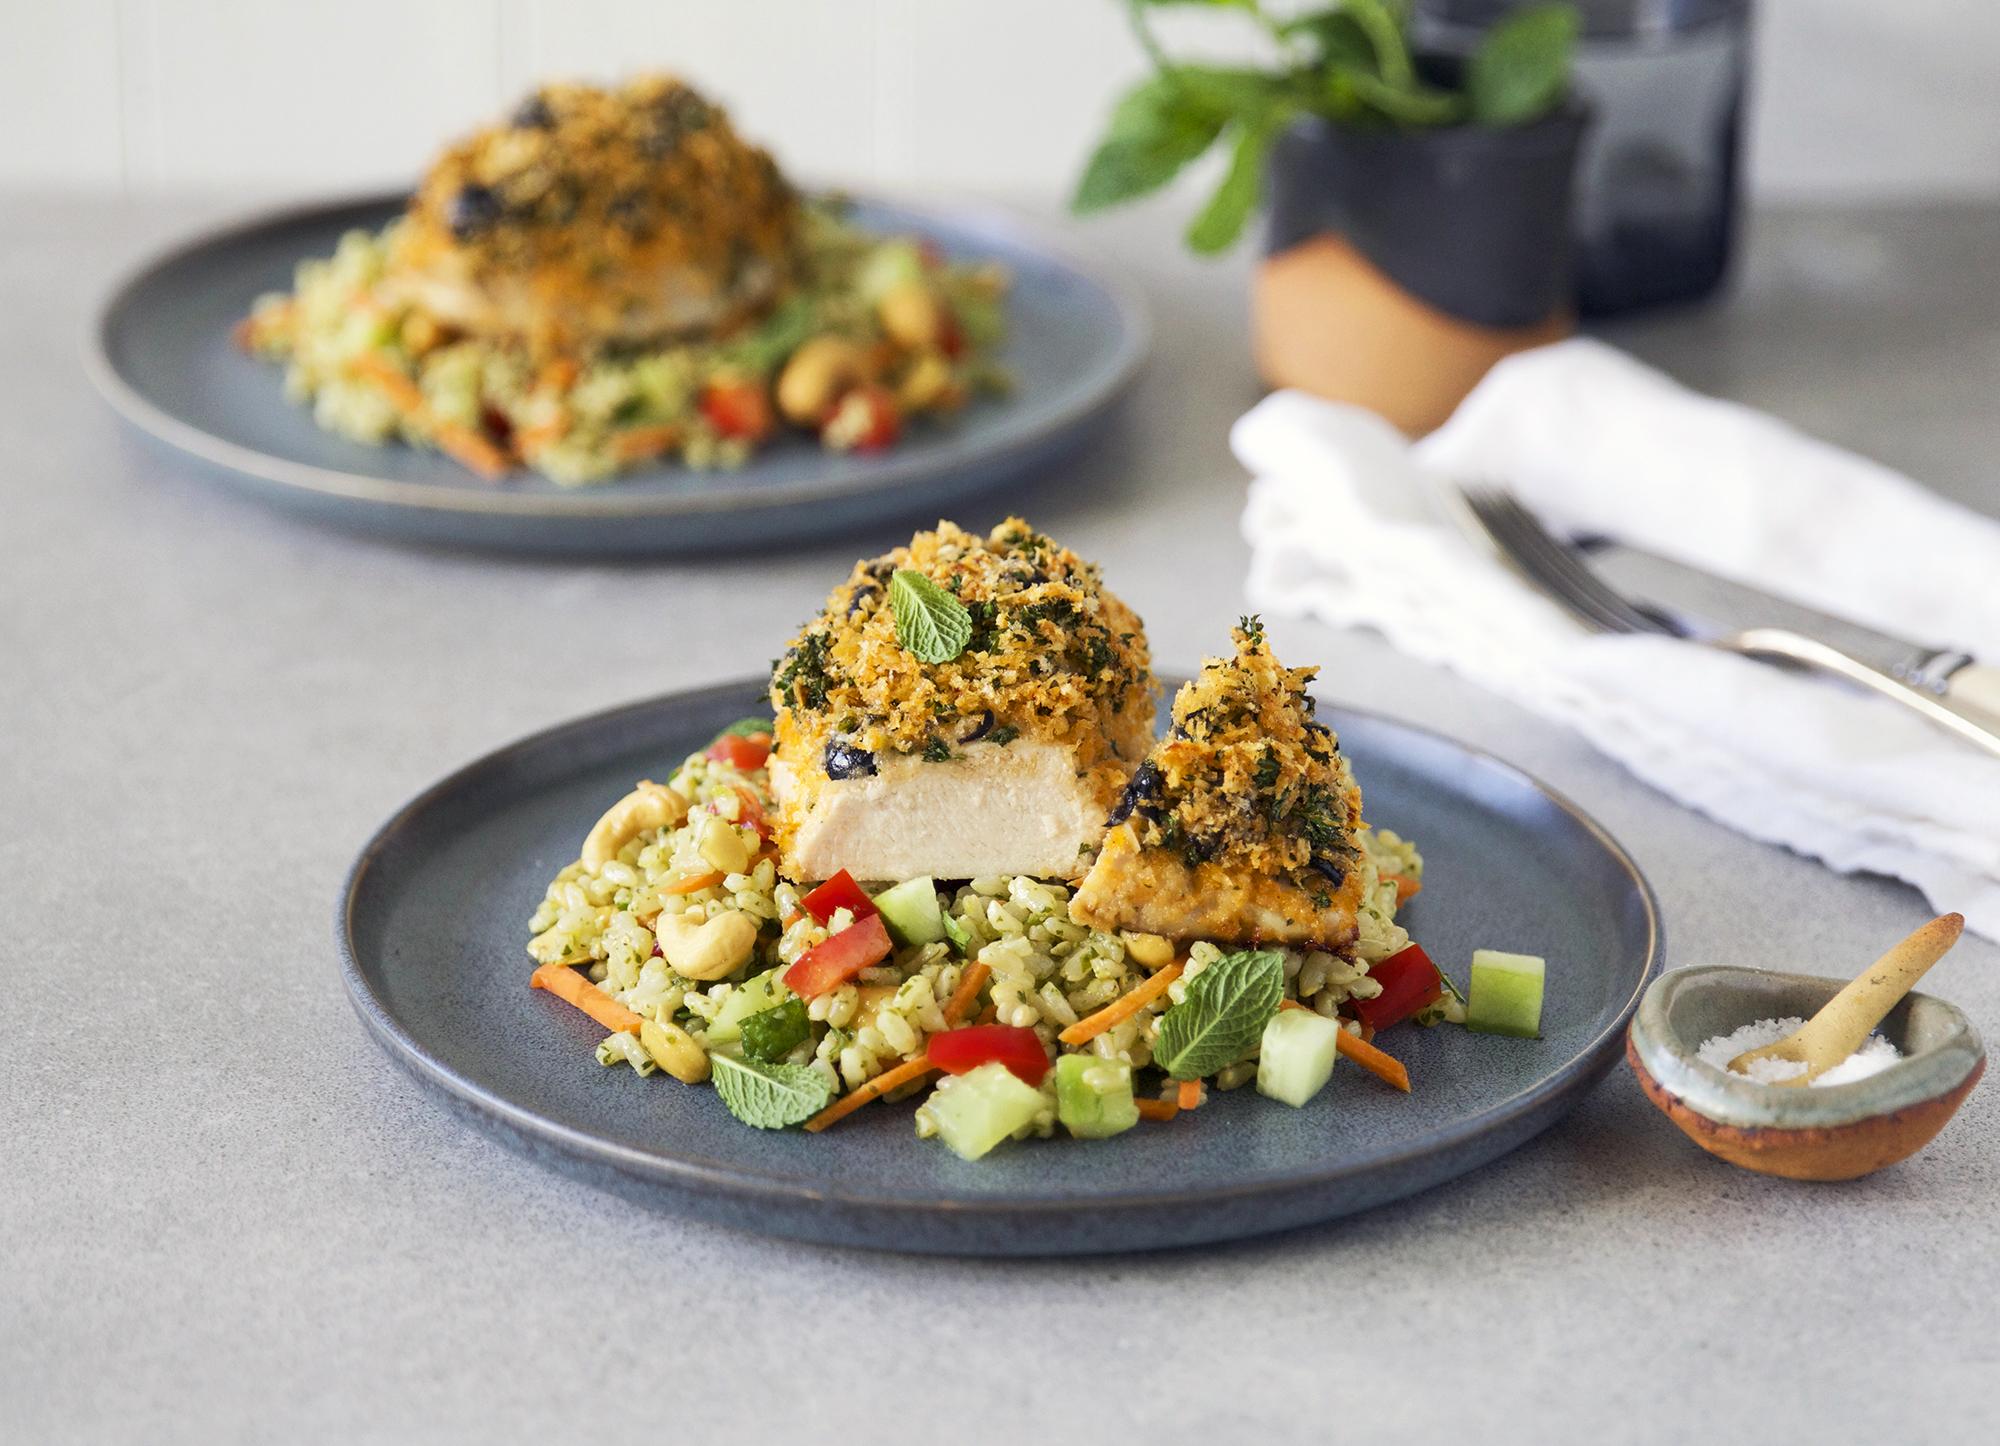 GeorgeJo_Crunchy Parmesan Herb Paprika Chicken Breast2_web.jpg